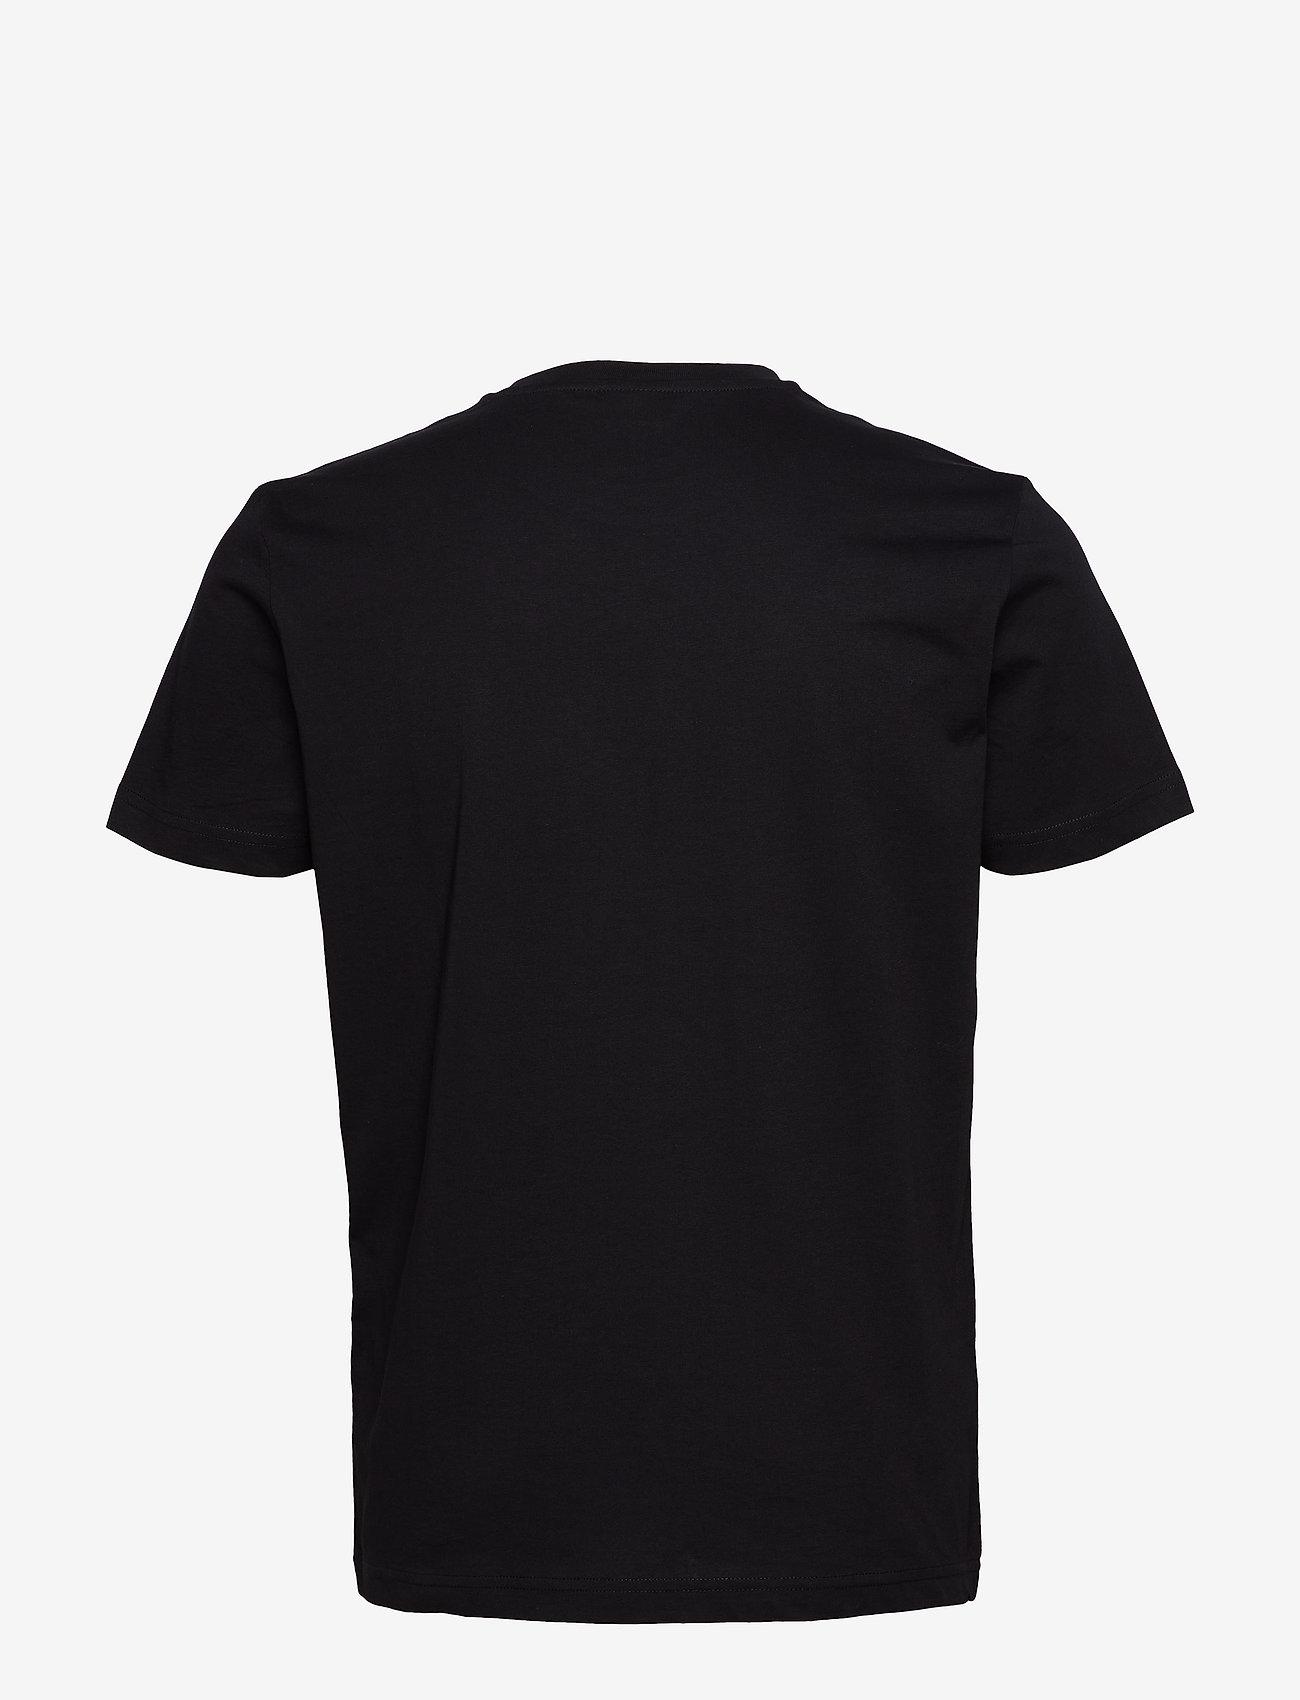 Diesel Men - T-DIEGOS-K30 T-SHIRT - basic t-shirts - caviar - 1